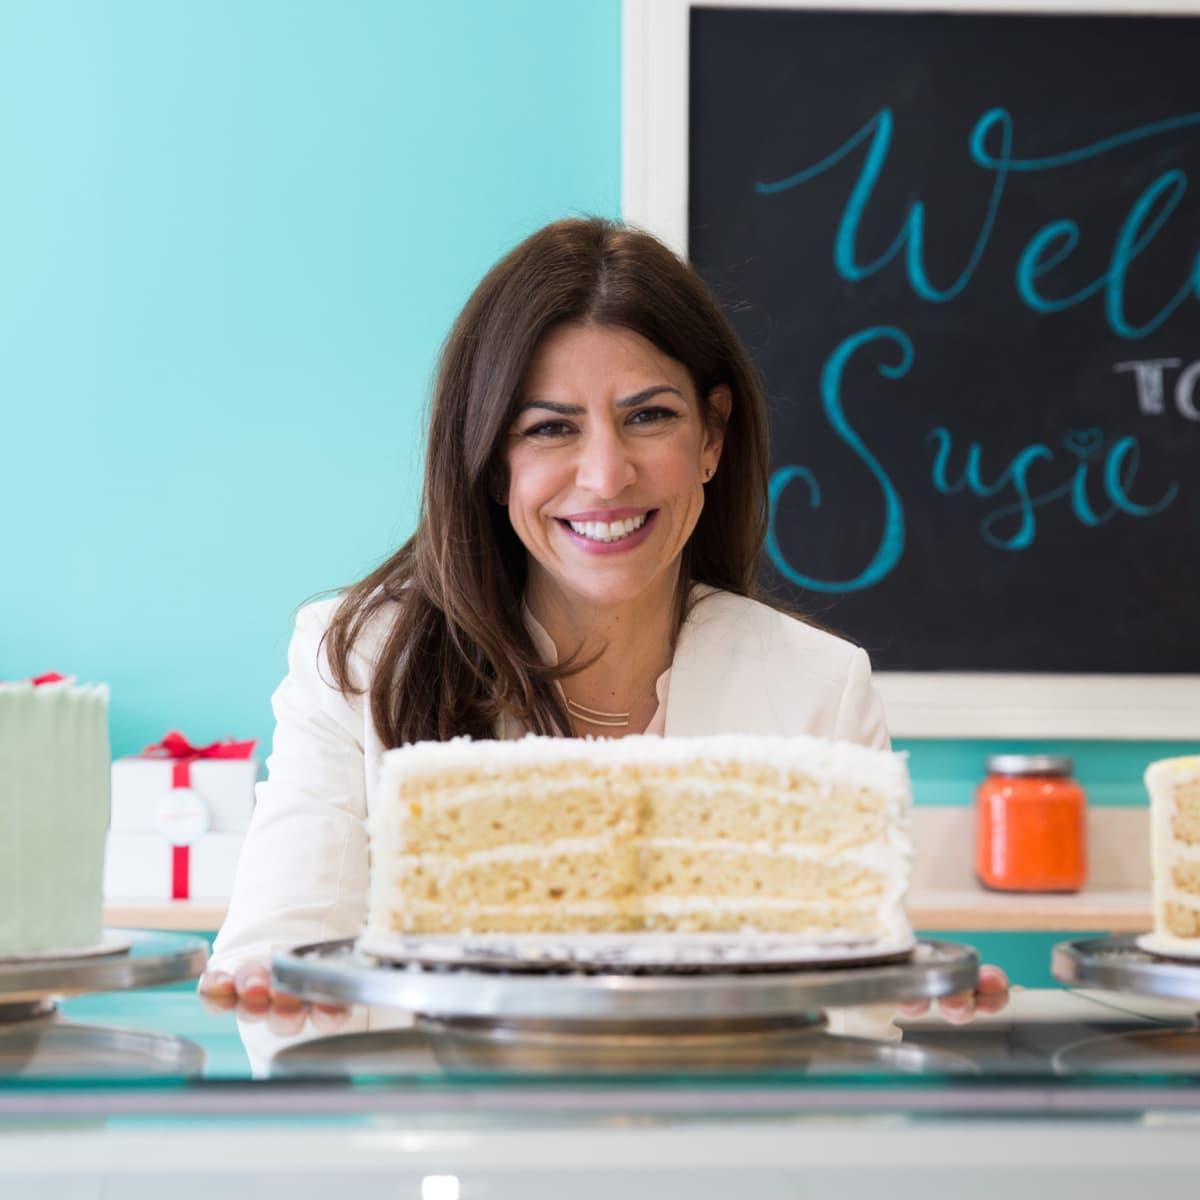 Susie Cakes owner Susan Sarich